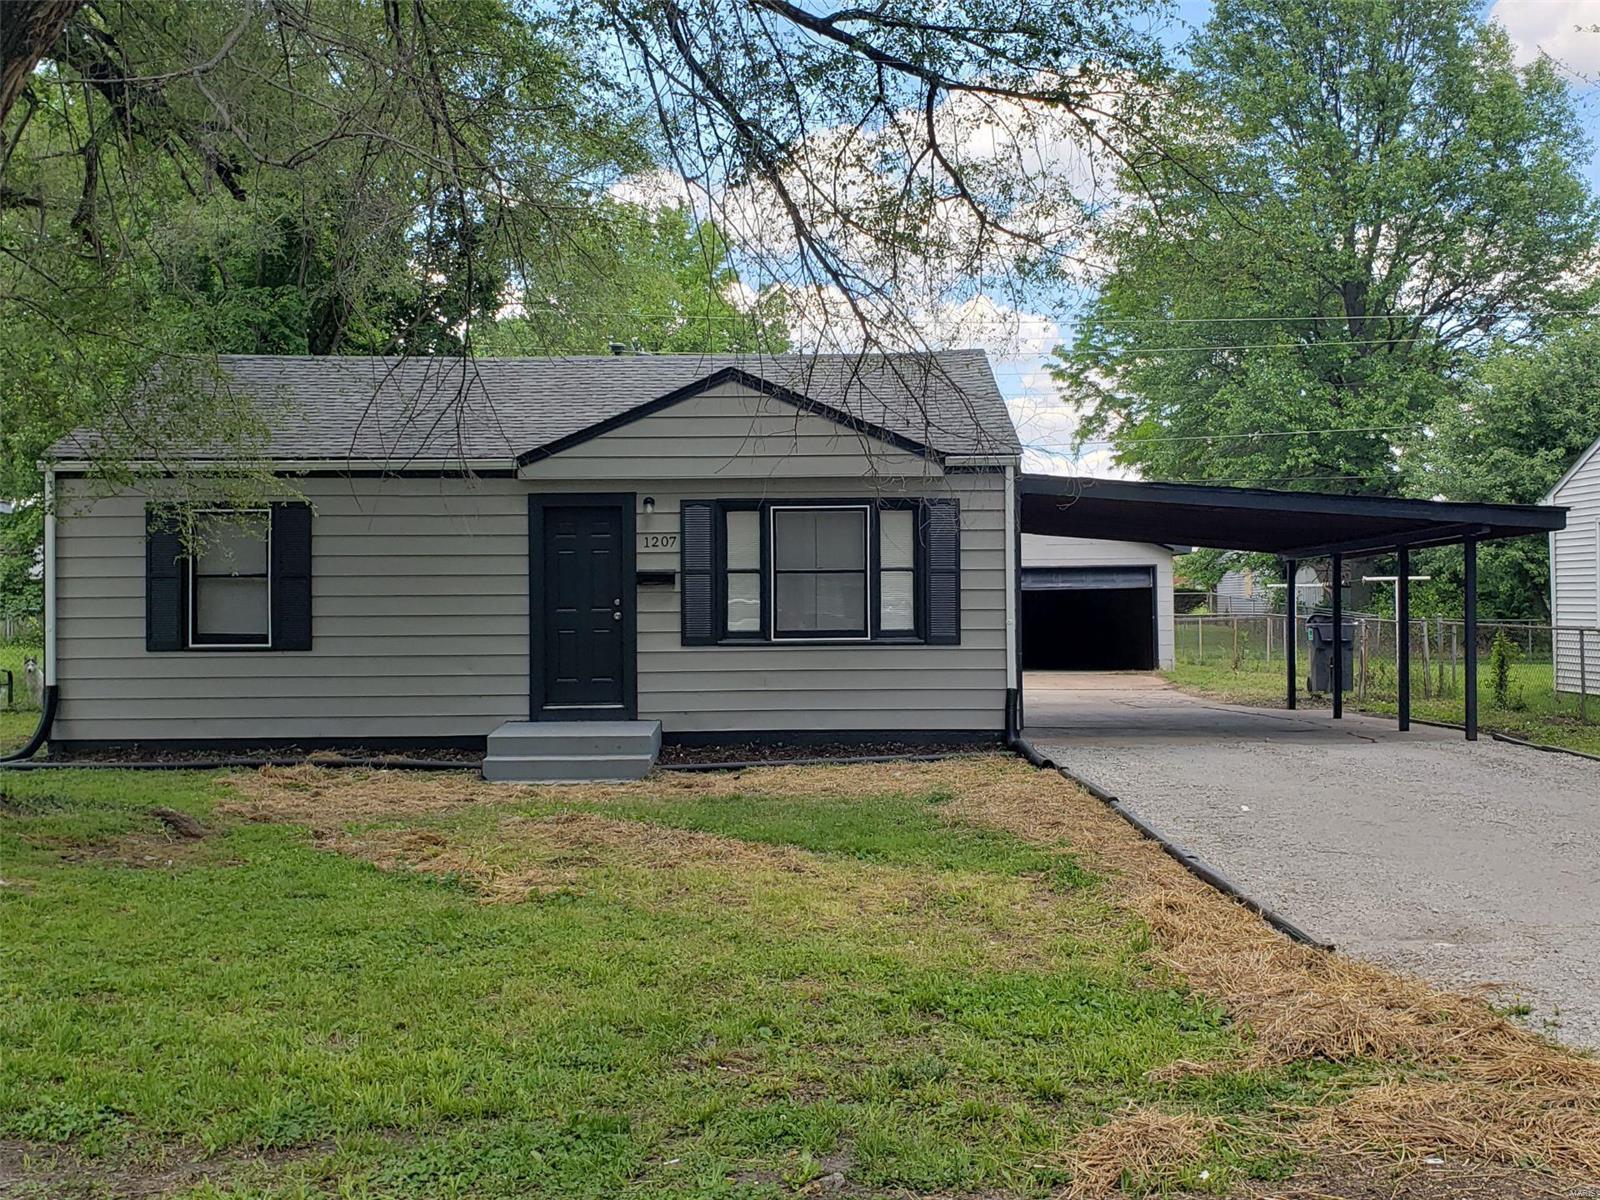 1207 Williams Property Photo - Cahokia, IL real estate listing